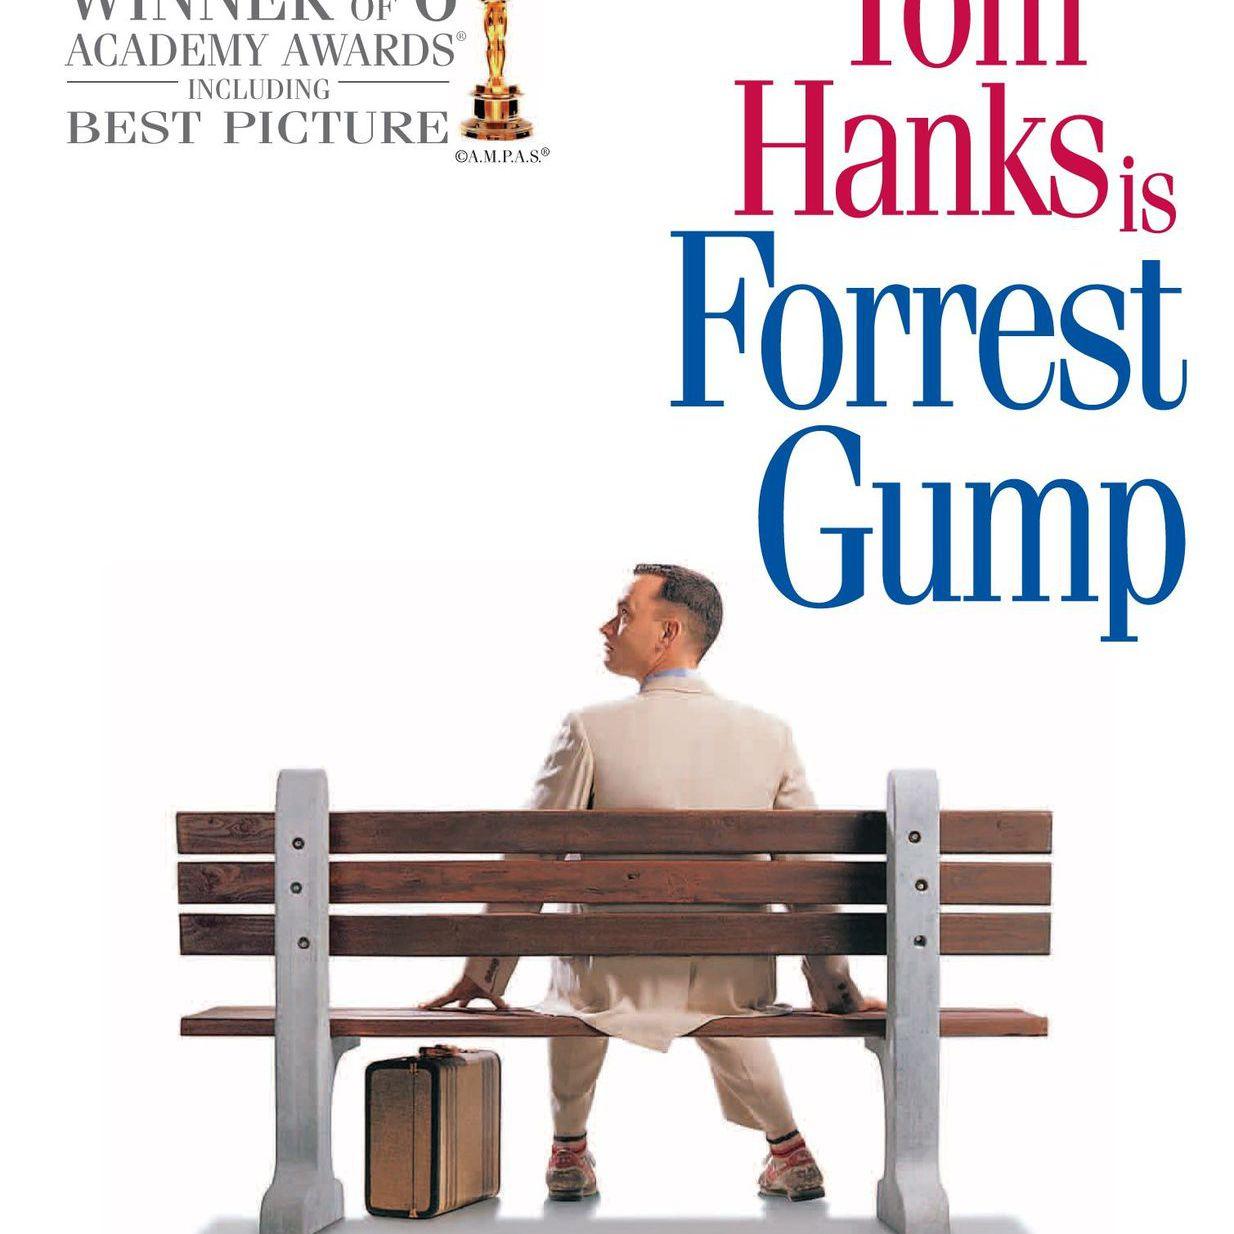 Promotional image for the film Forrest Gump